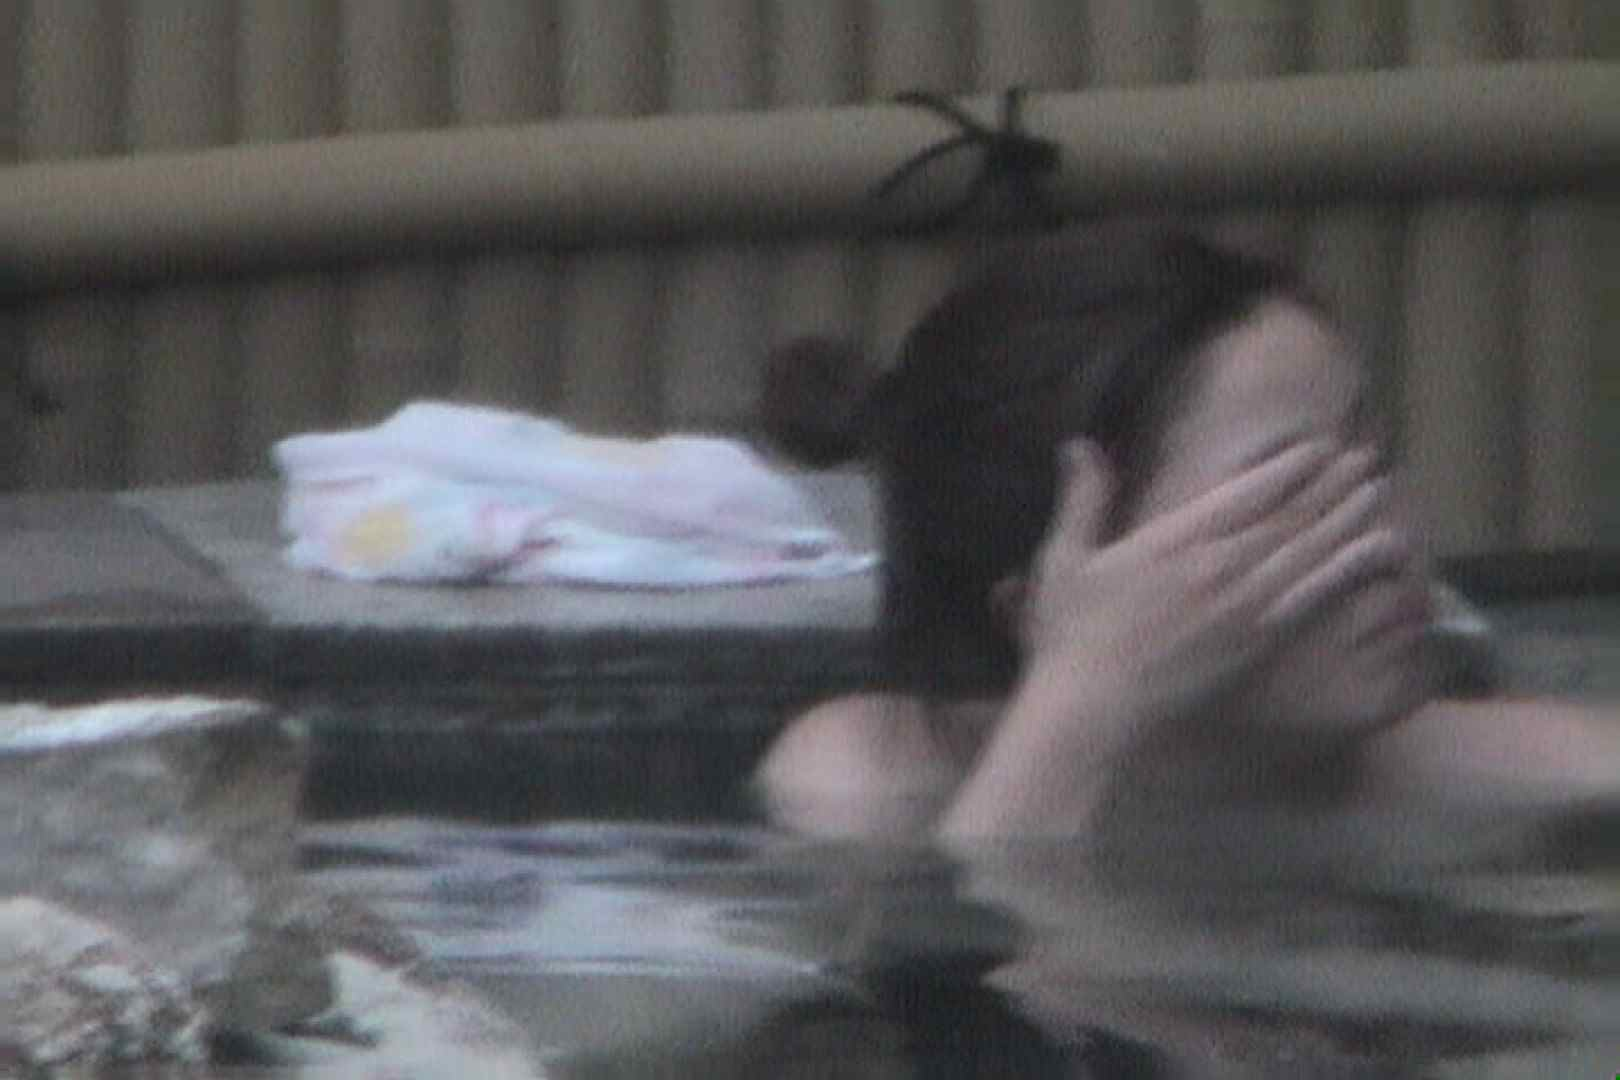 Aquaな露天風呂Vol.602 OLセックス 盗み撮りオマンコ動画キャプチャ 70画像 53